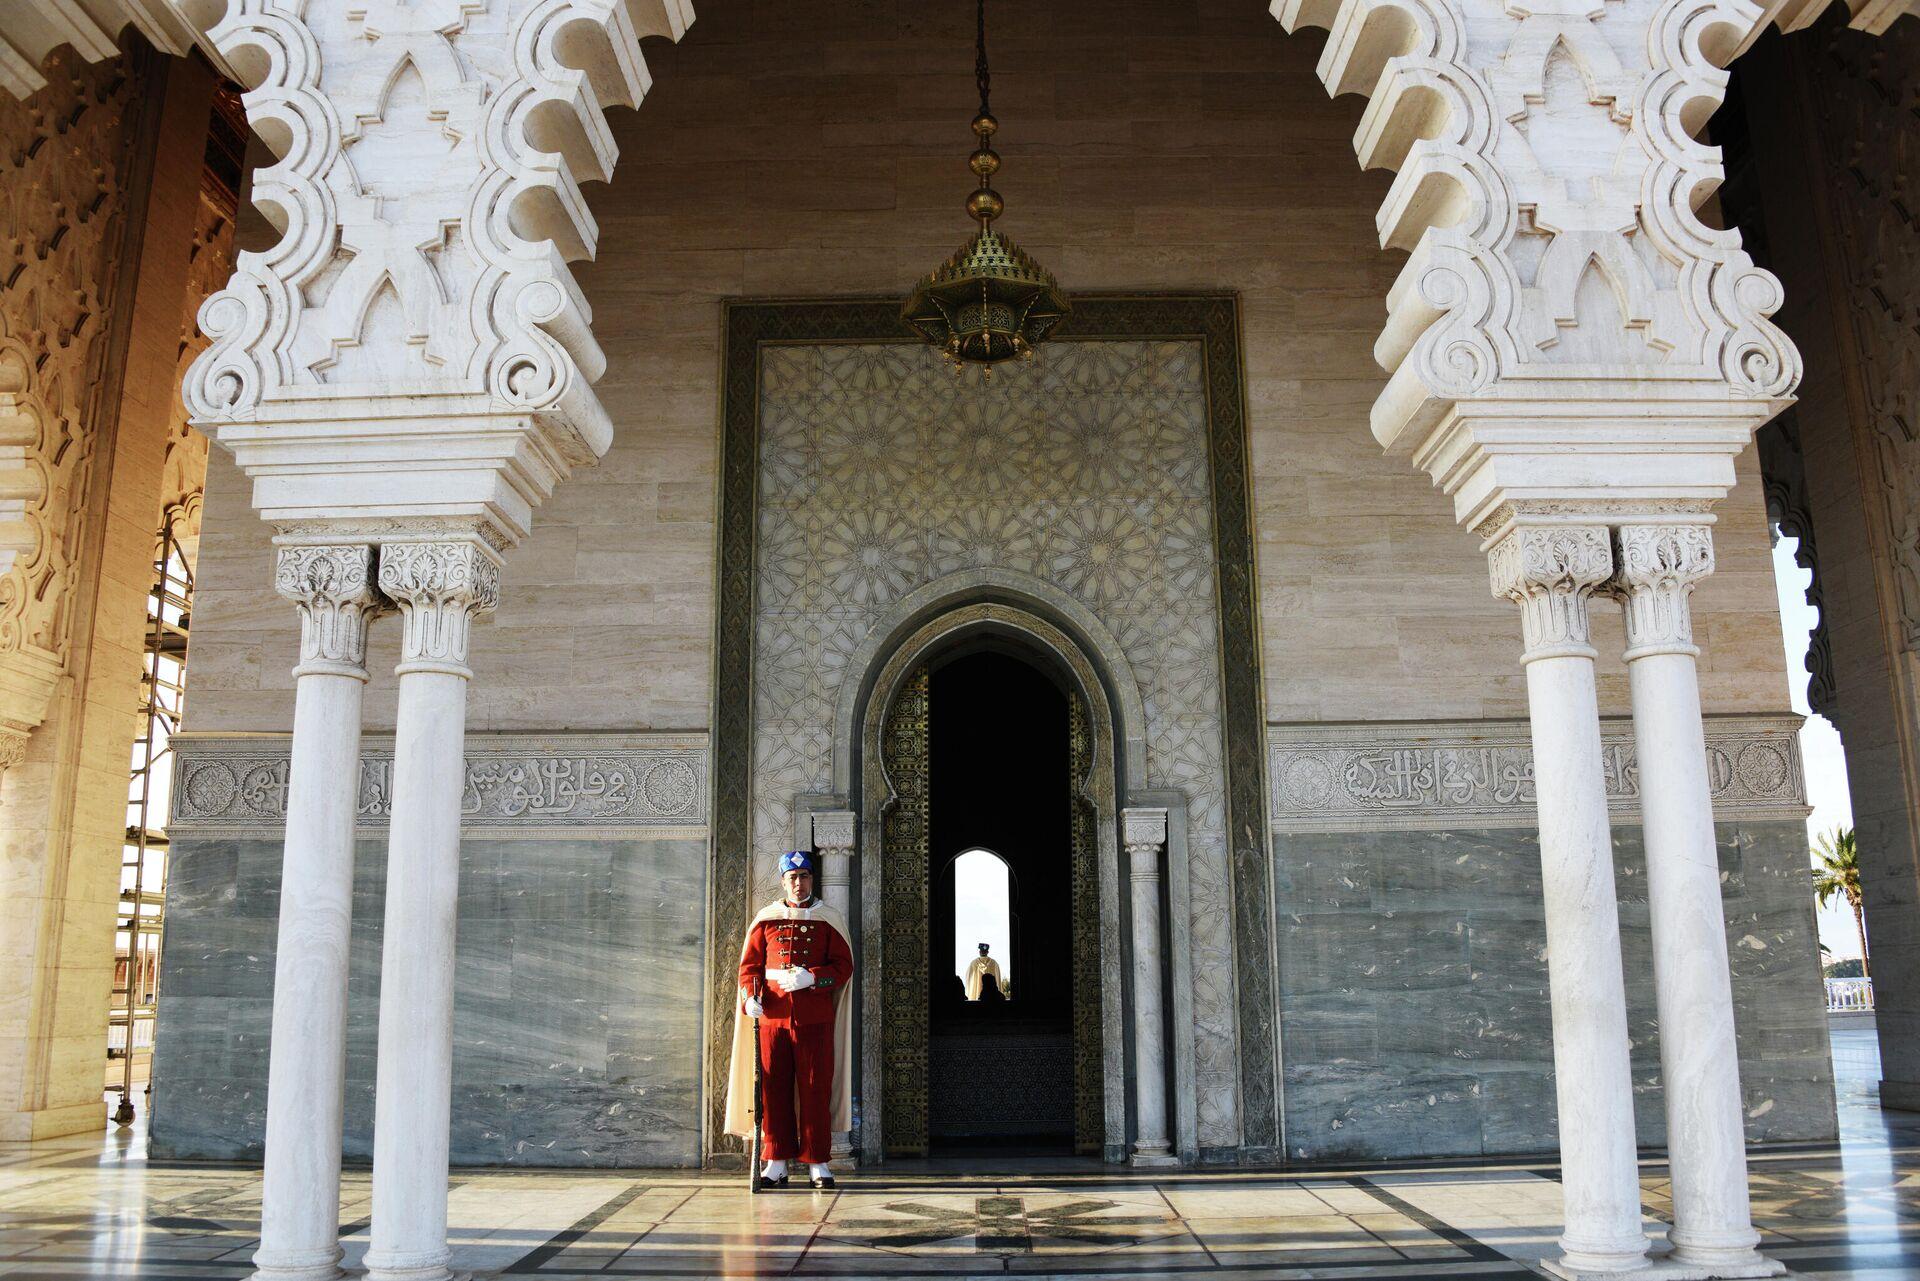 Гвардеец у входа в Мавзолей Мохаммеда V (короля Марокко) в Рабате. - РИА Новости, 1920, 25.12.2020